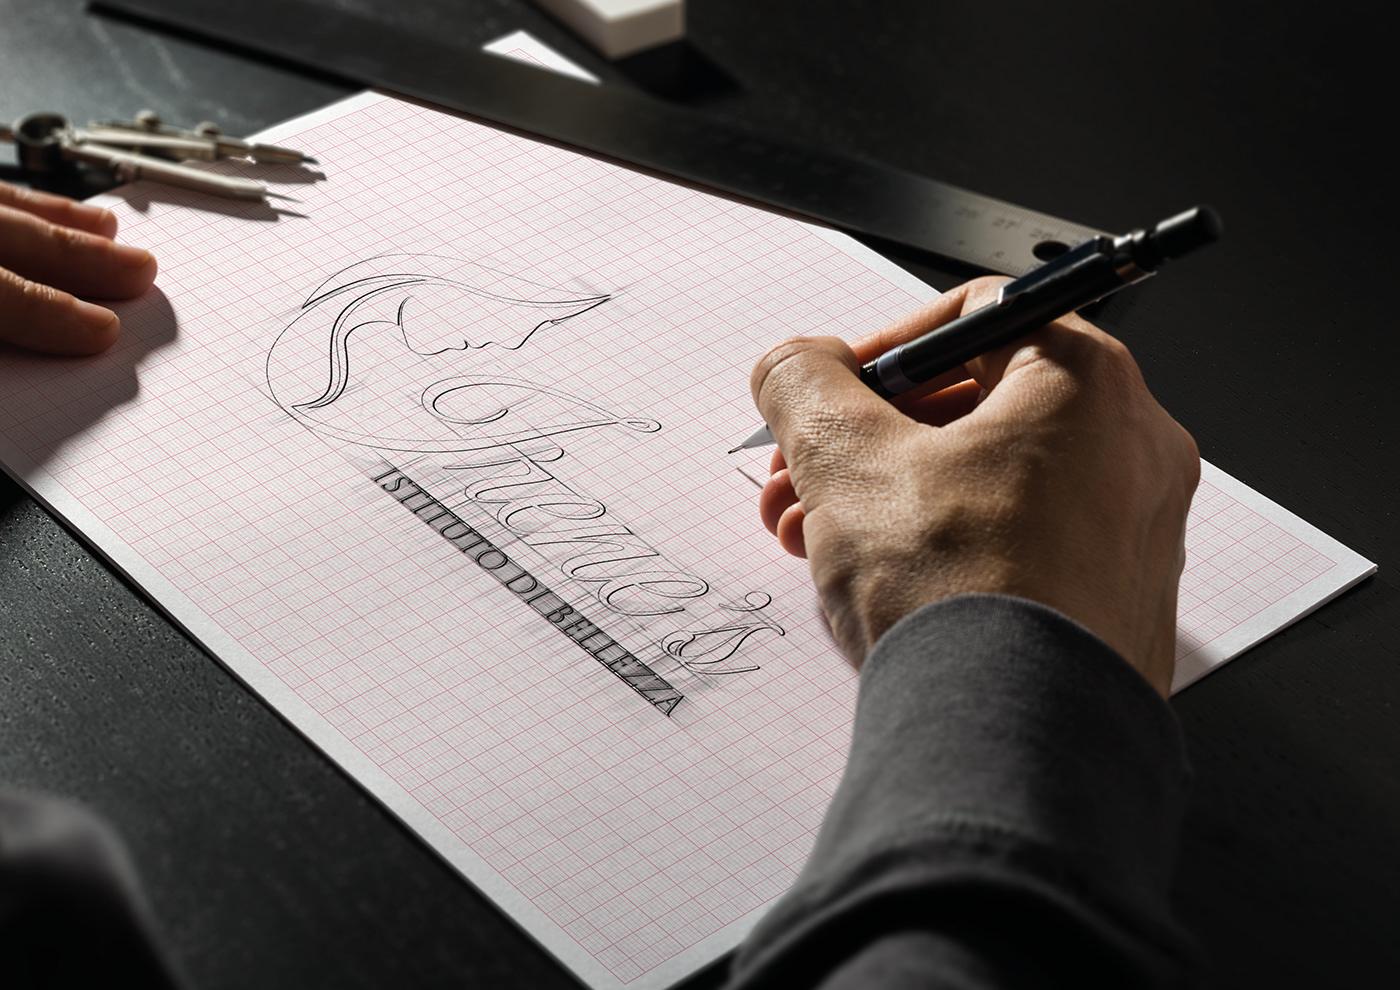 Image may contain: person, handwriting and drawing